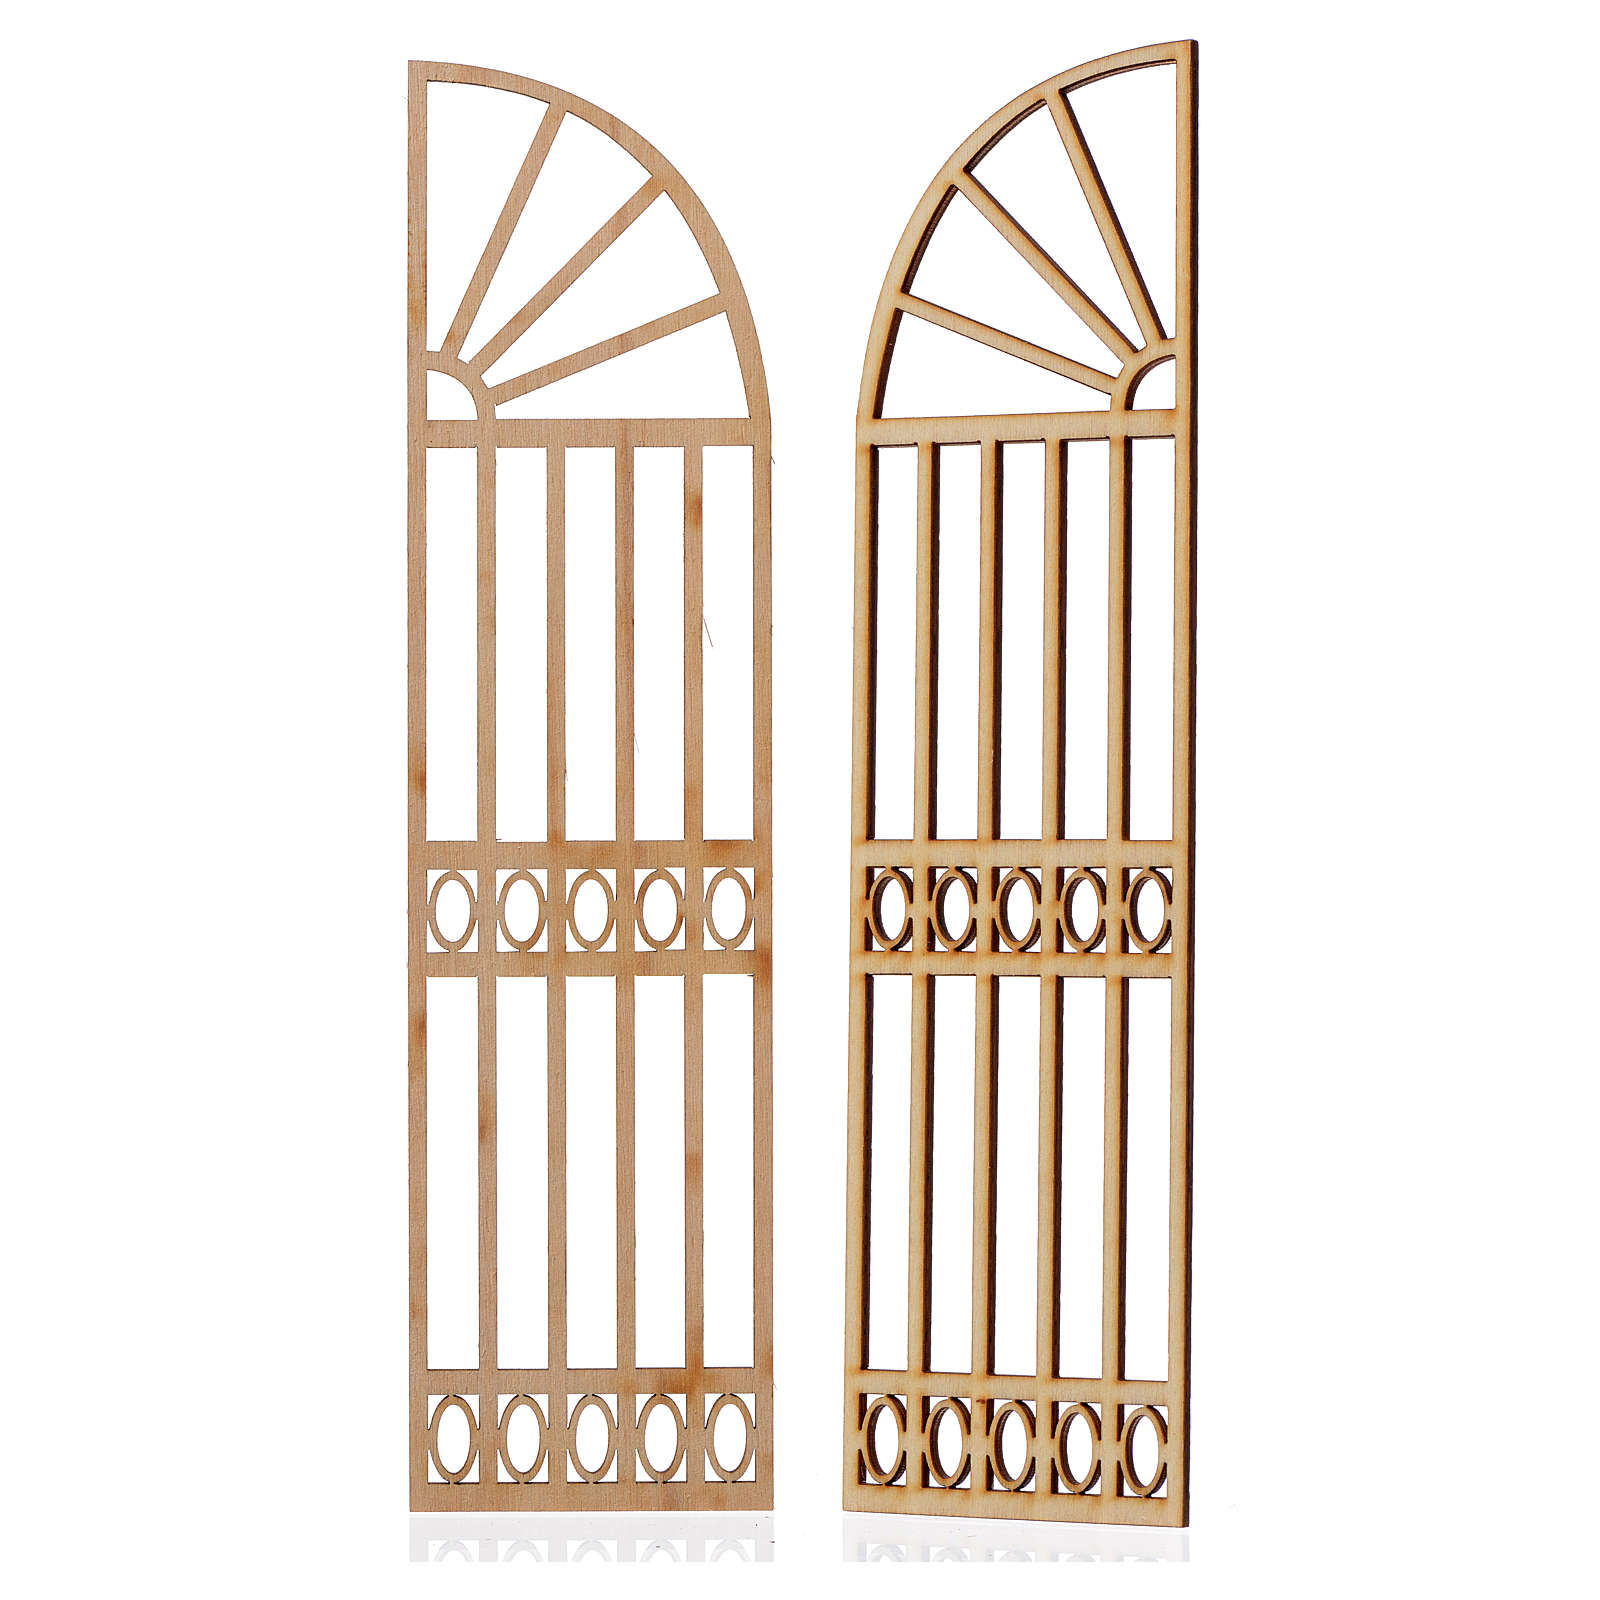 Portón belén madera 2 piezas 22x11 4